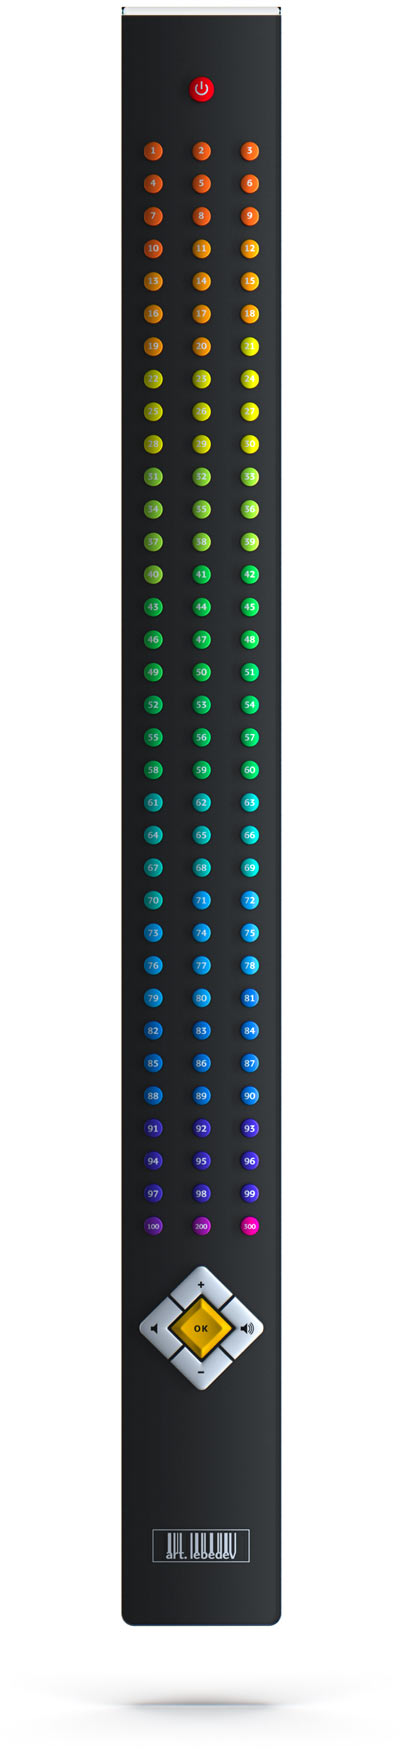 pultius remote control art.lebedev